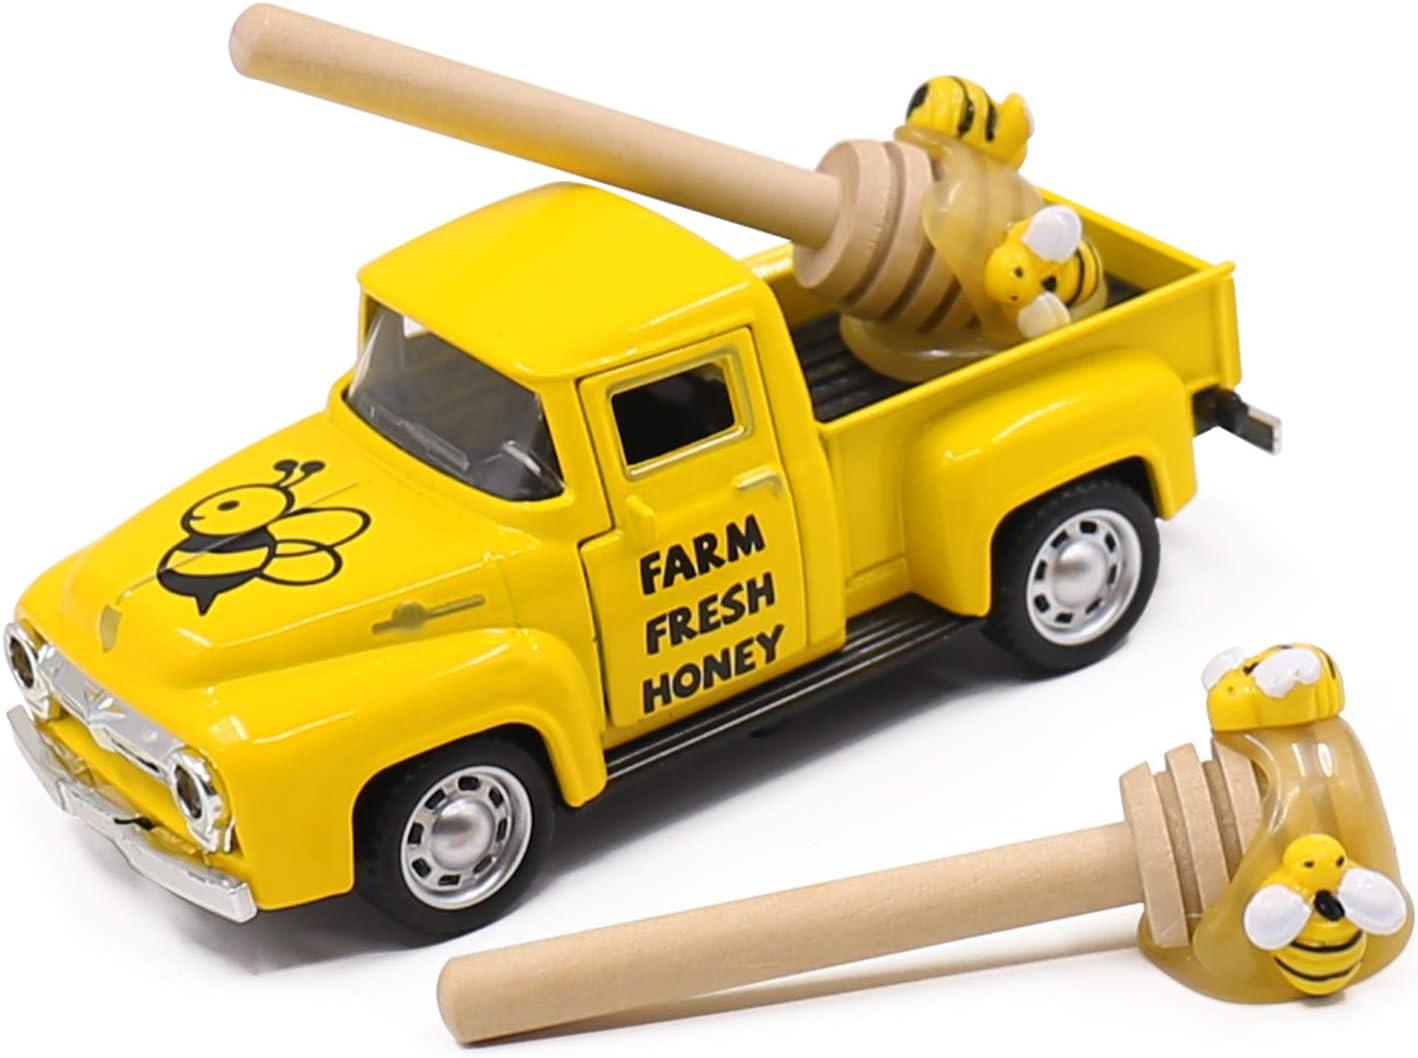 Huray Rayho Mini Farm Fresh Honey Yellow Truck Toy with Faux Honey Dippers Farmhouse Honeybee Tiered Tray Decor Vintage Pickup Metal Truck Spring Summer Bookshelf Table Decors